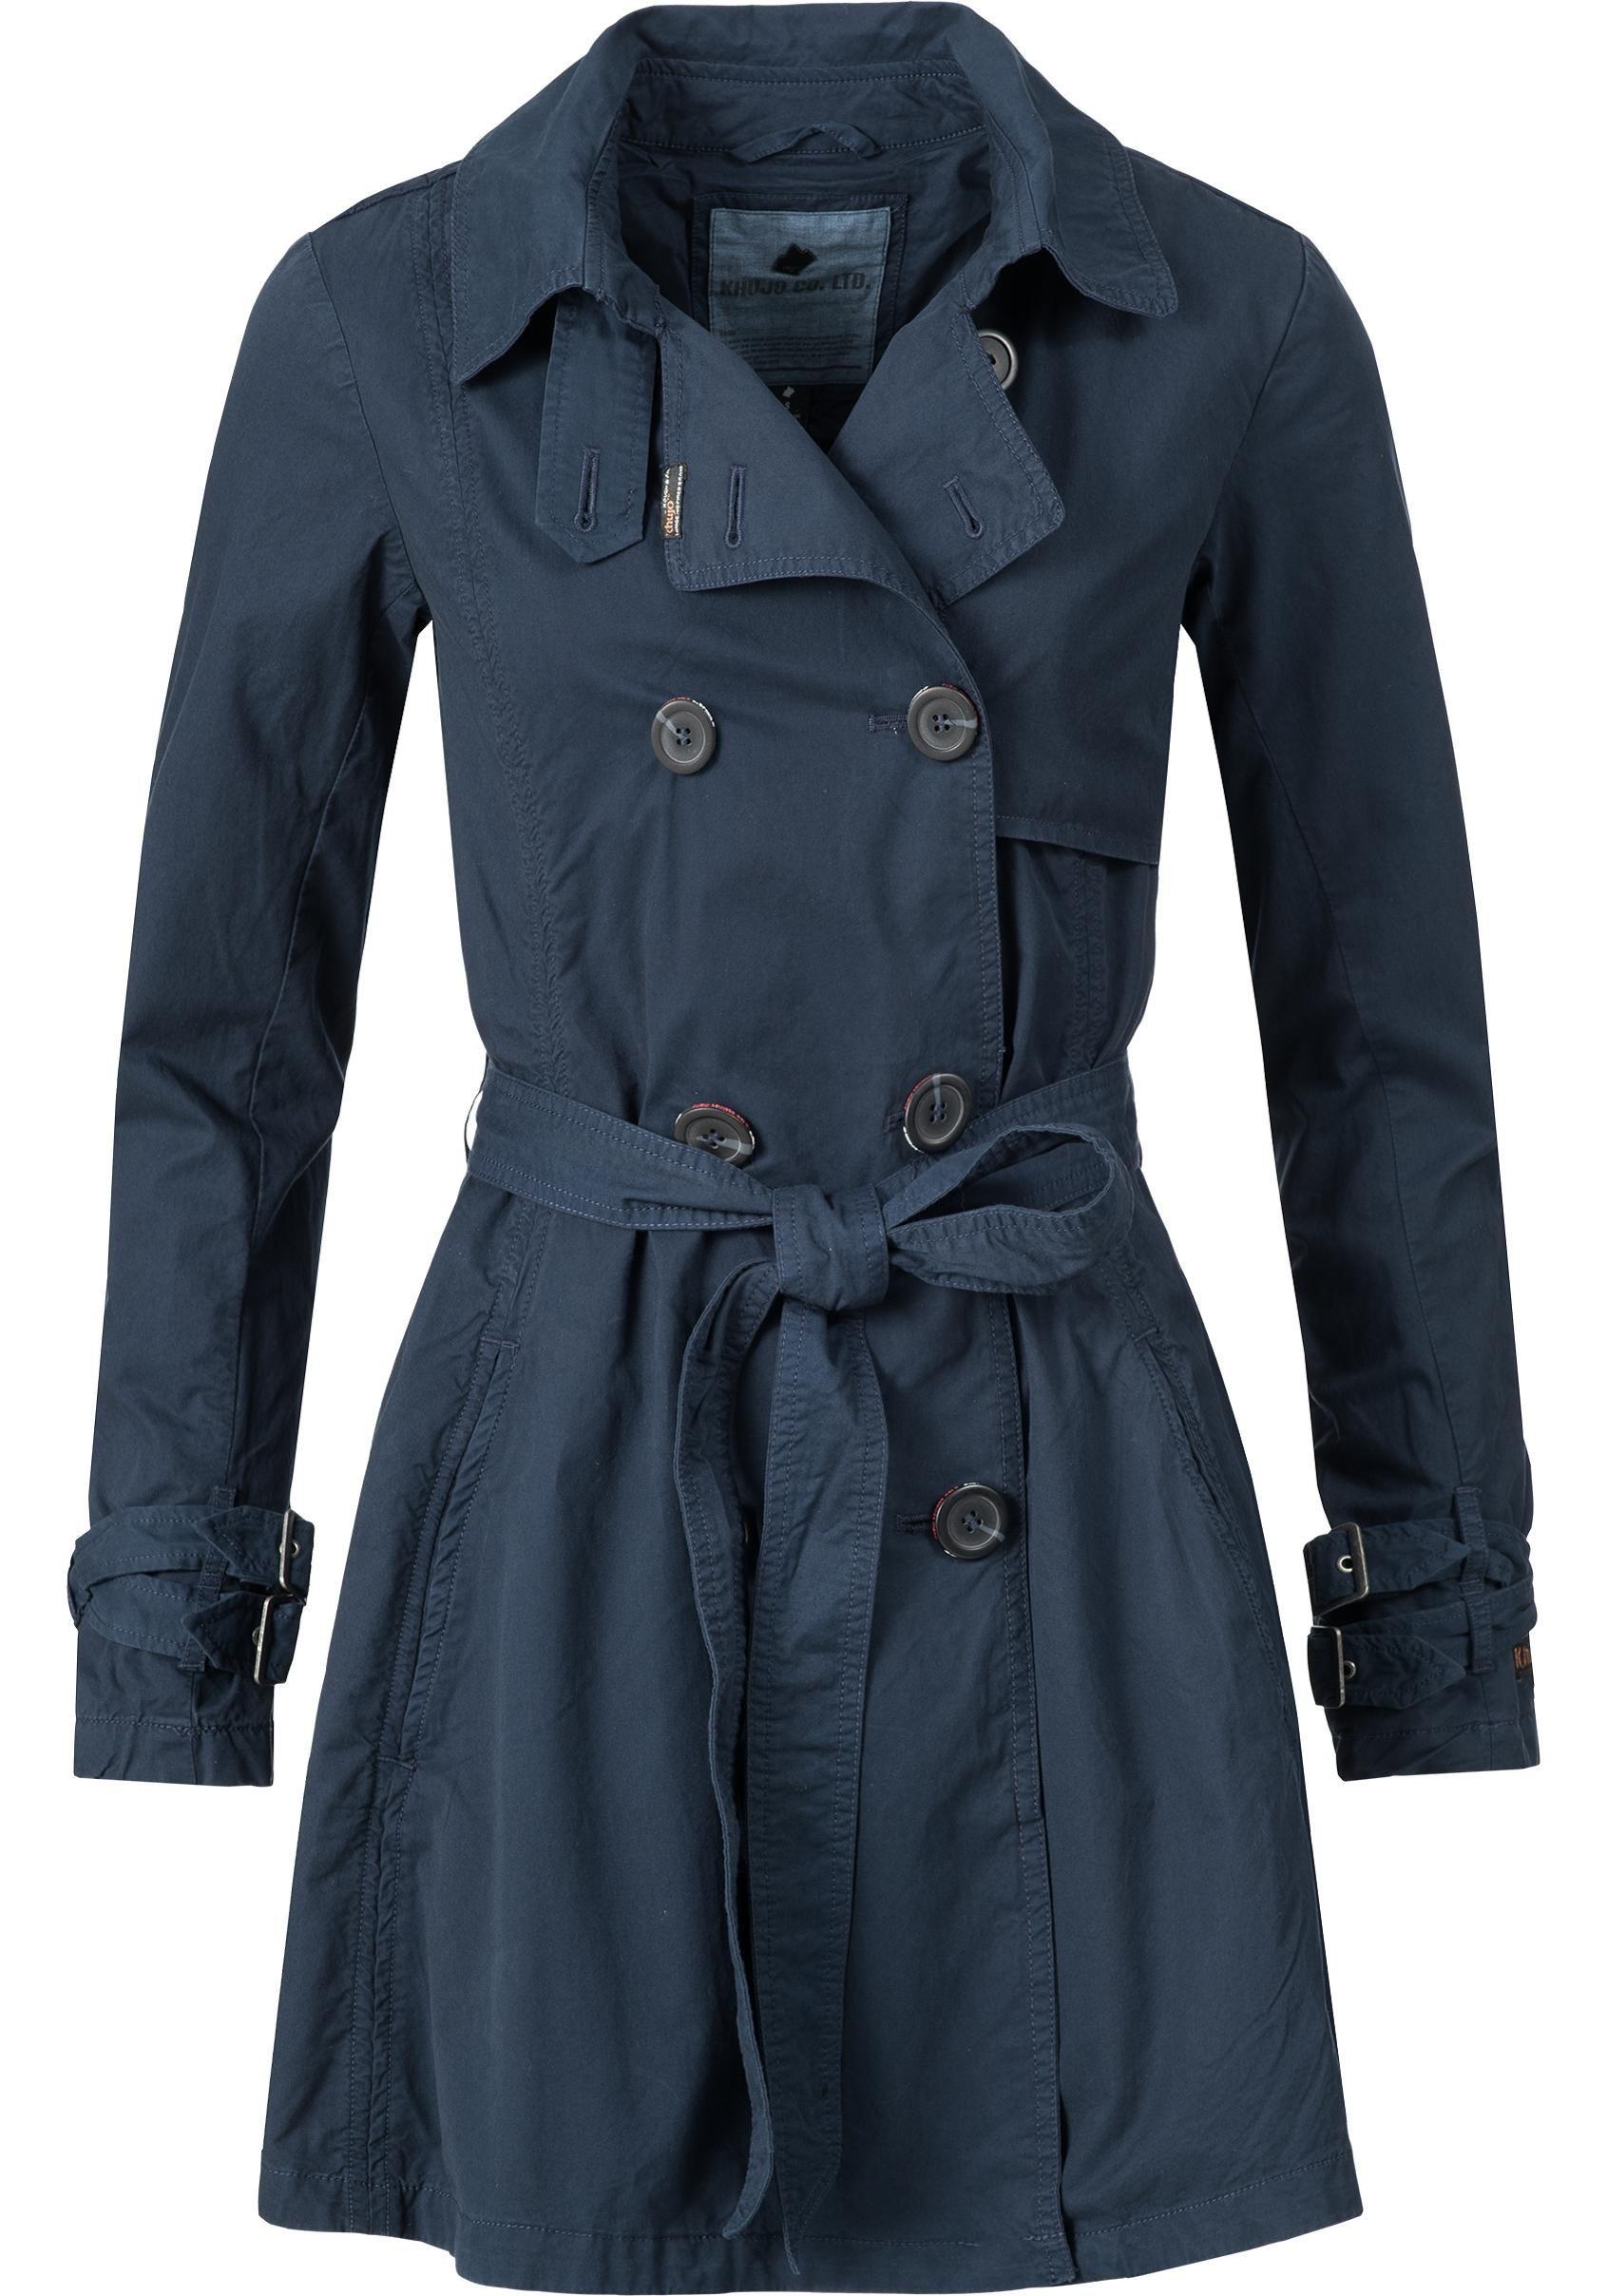 khujo Trenchcoat »YM-Merita«, stylischer Übergangsmantel mit edler zweireihigen Knopfleiste | Bekleidung > Mäntel > Trenchcoats | khujo